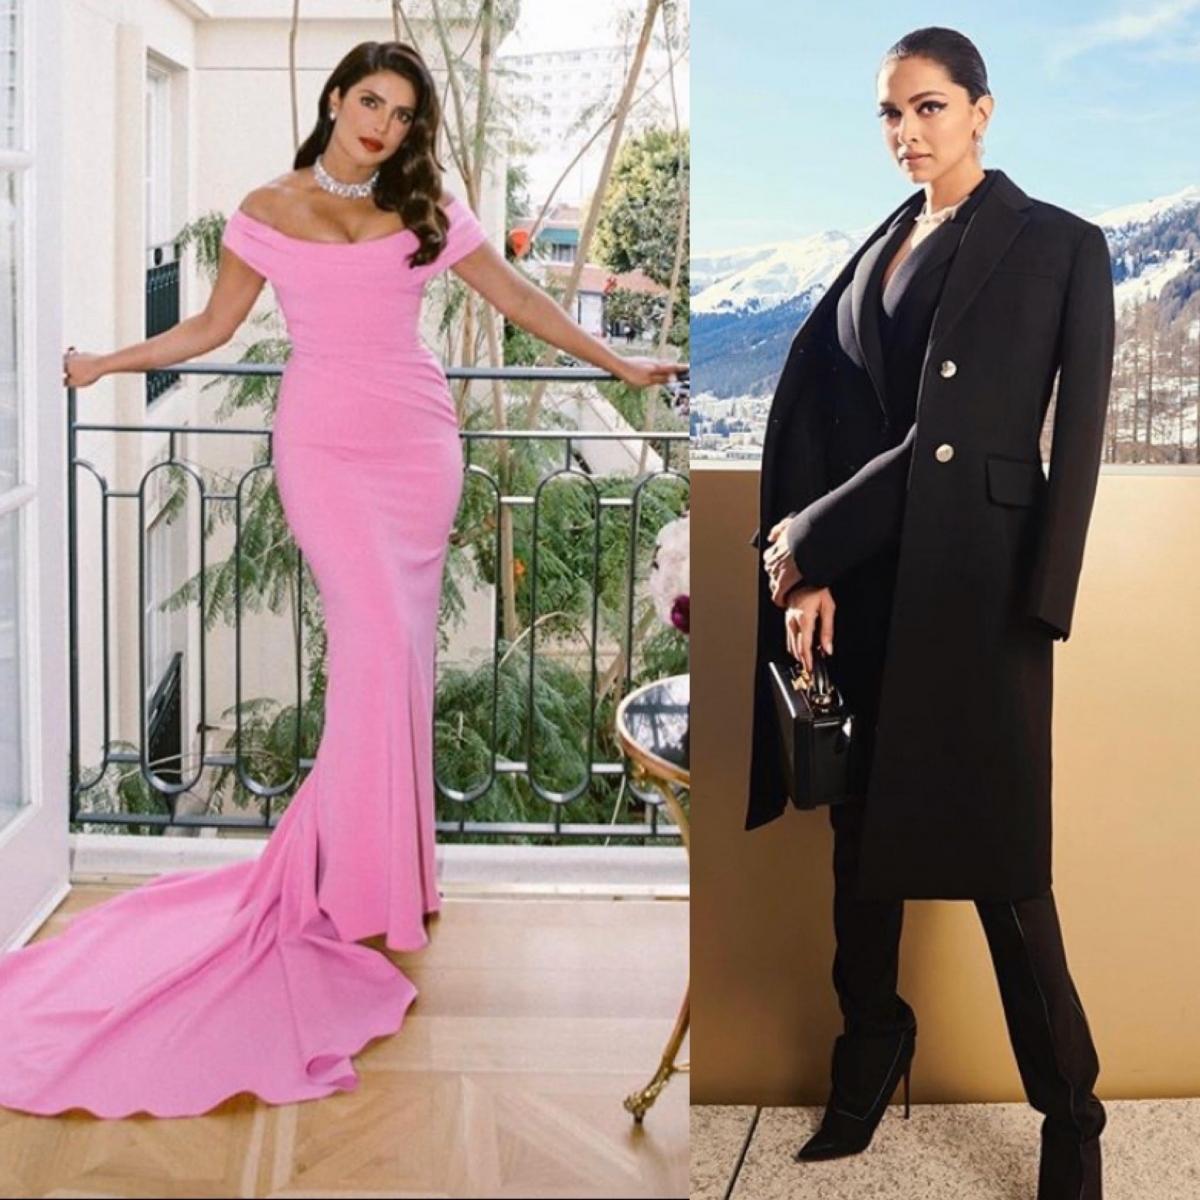 Image result for Priyanka Chopra and Deepika in Hollywood